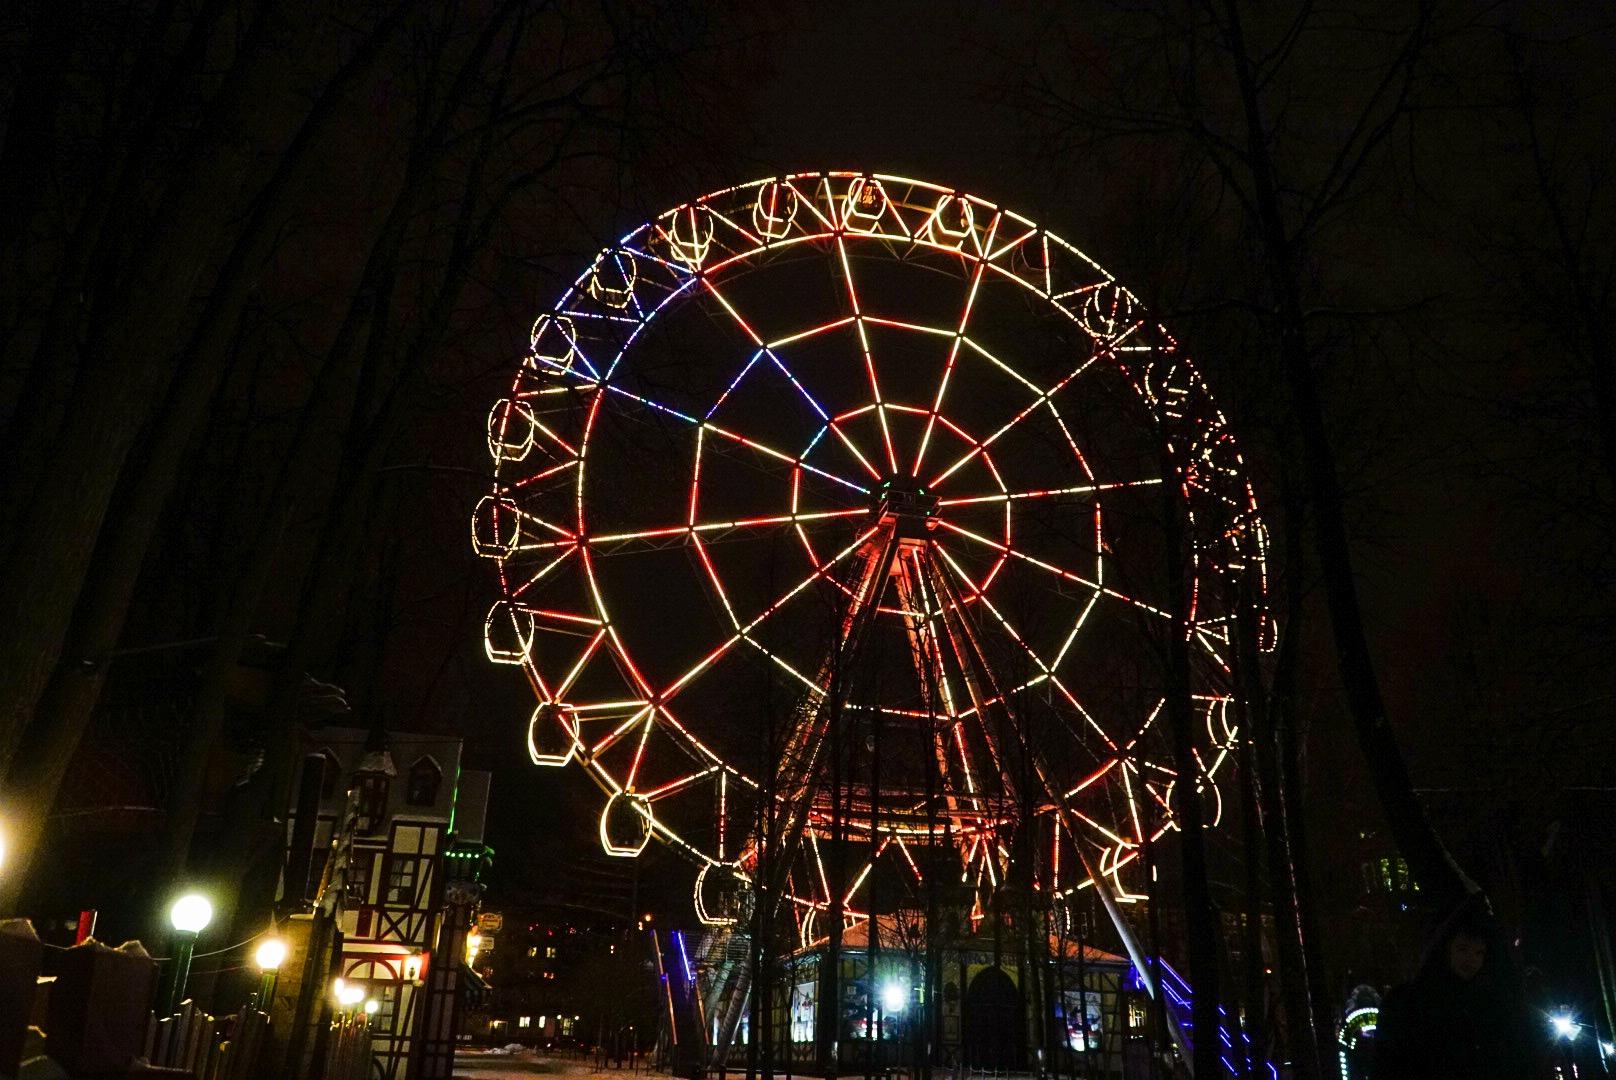 Amusement Park Perm, Russian Federation